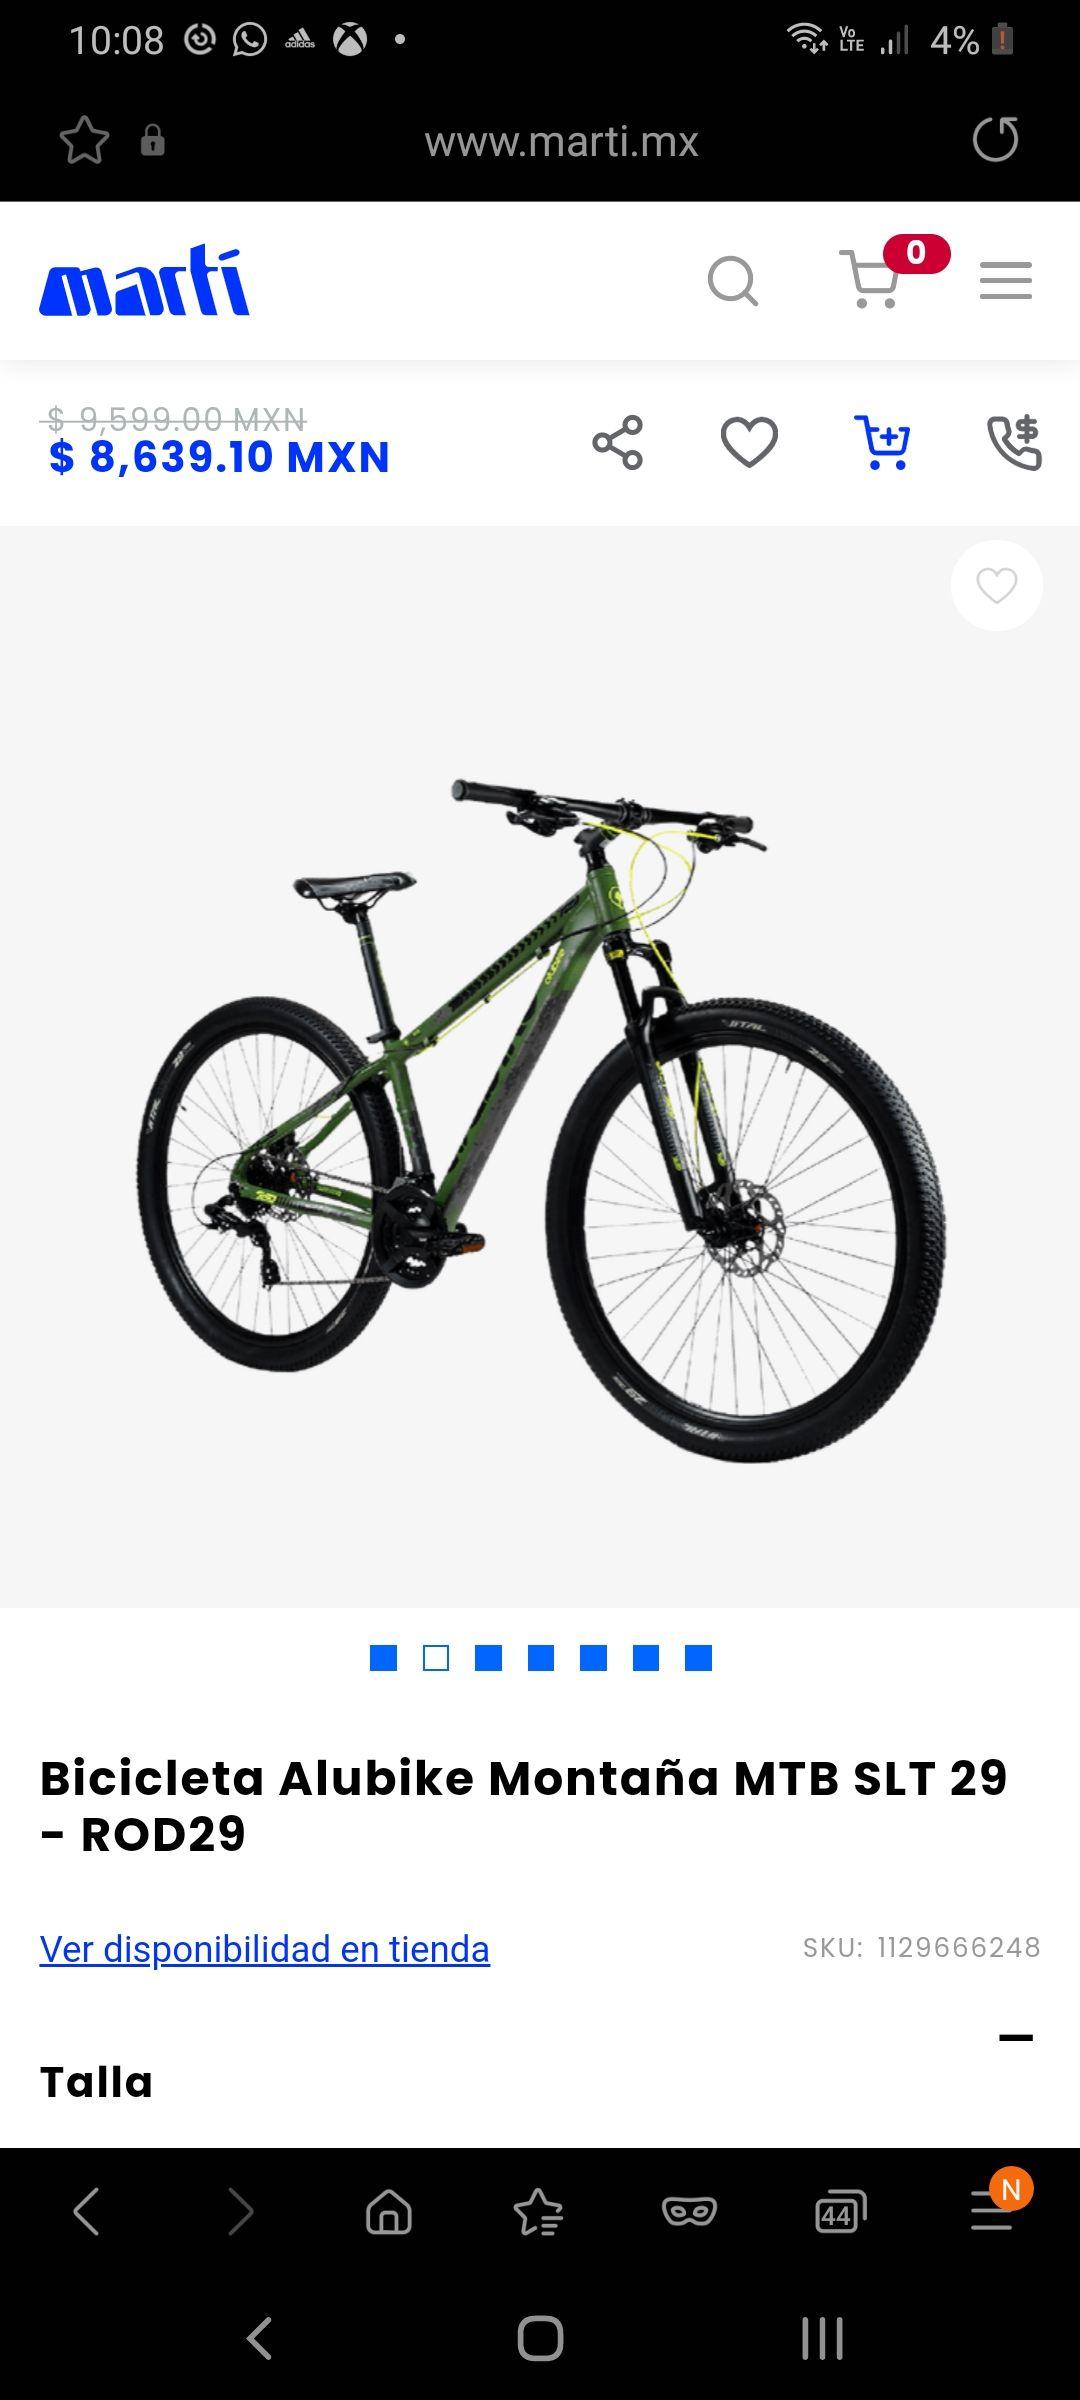 Martí, Bicicleta alubike R29 montaña